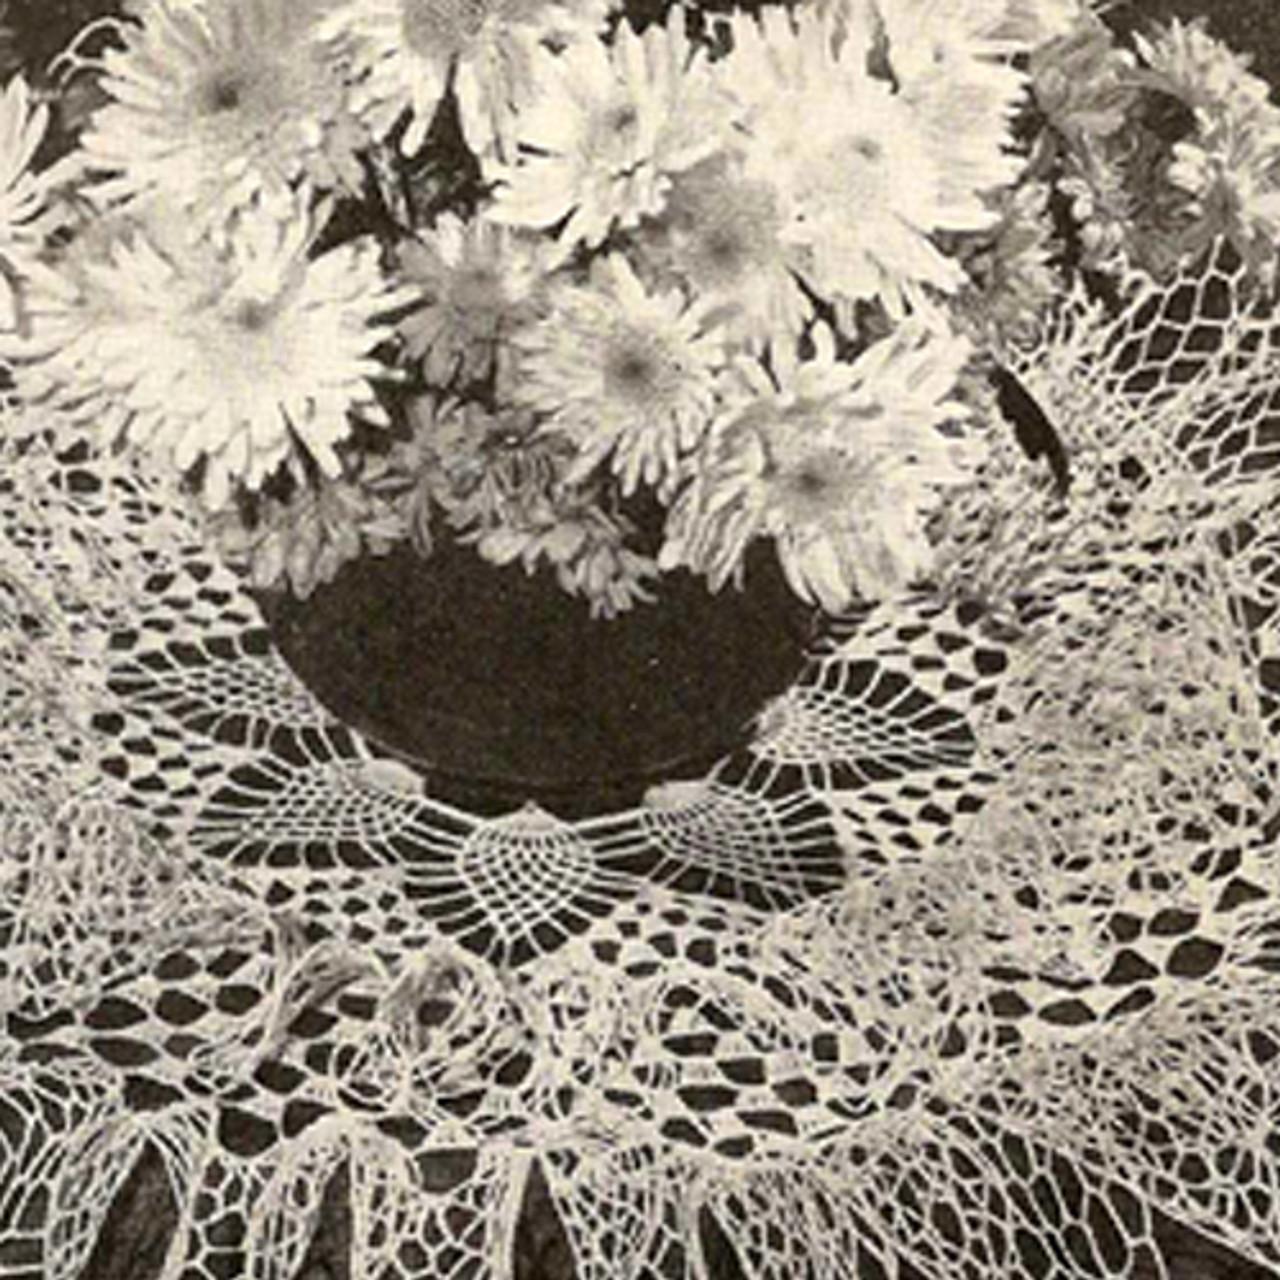 Pineapple Centered Ruffle Doily Crochet pattern